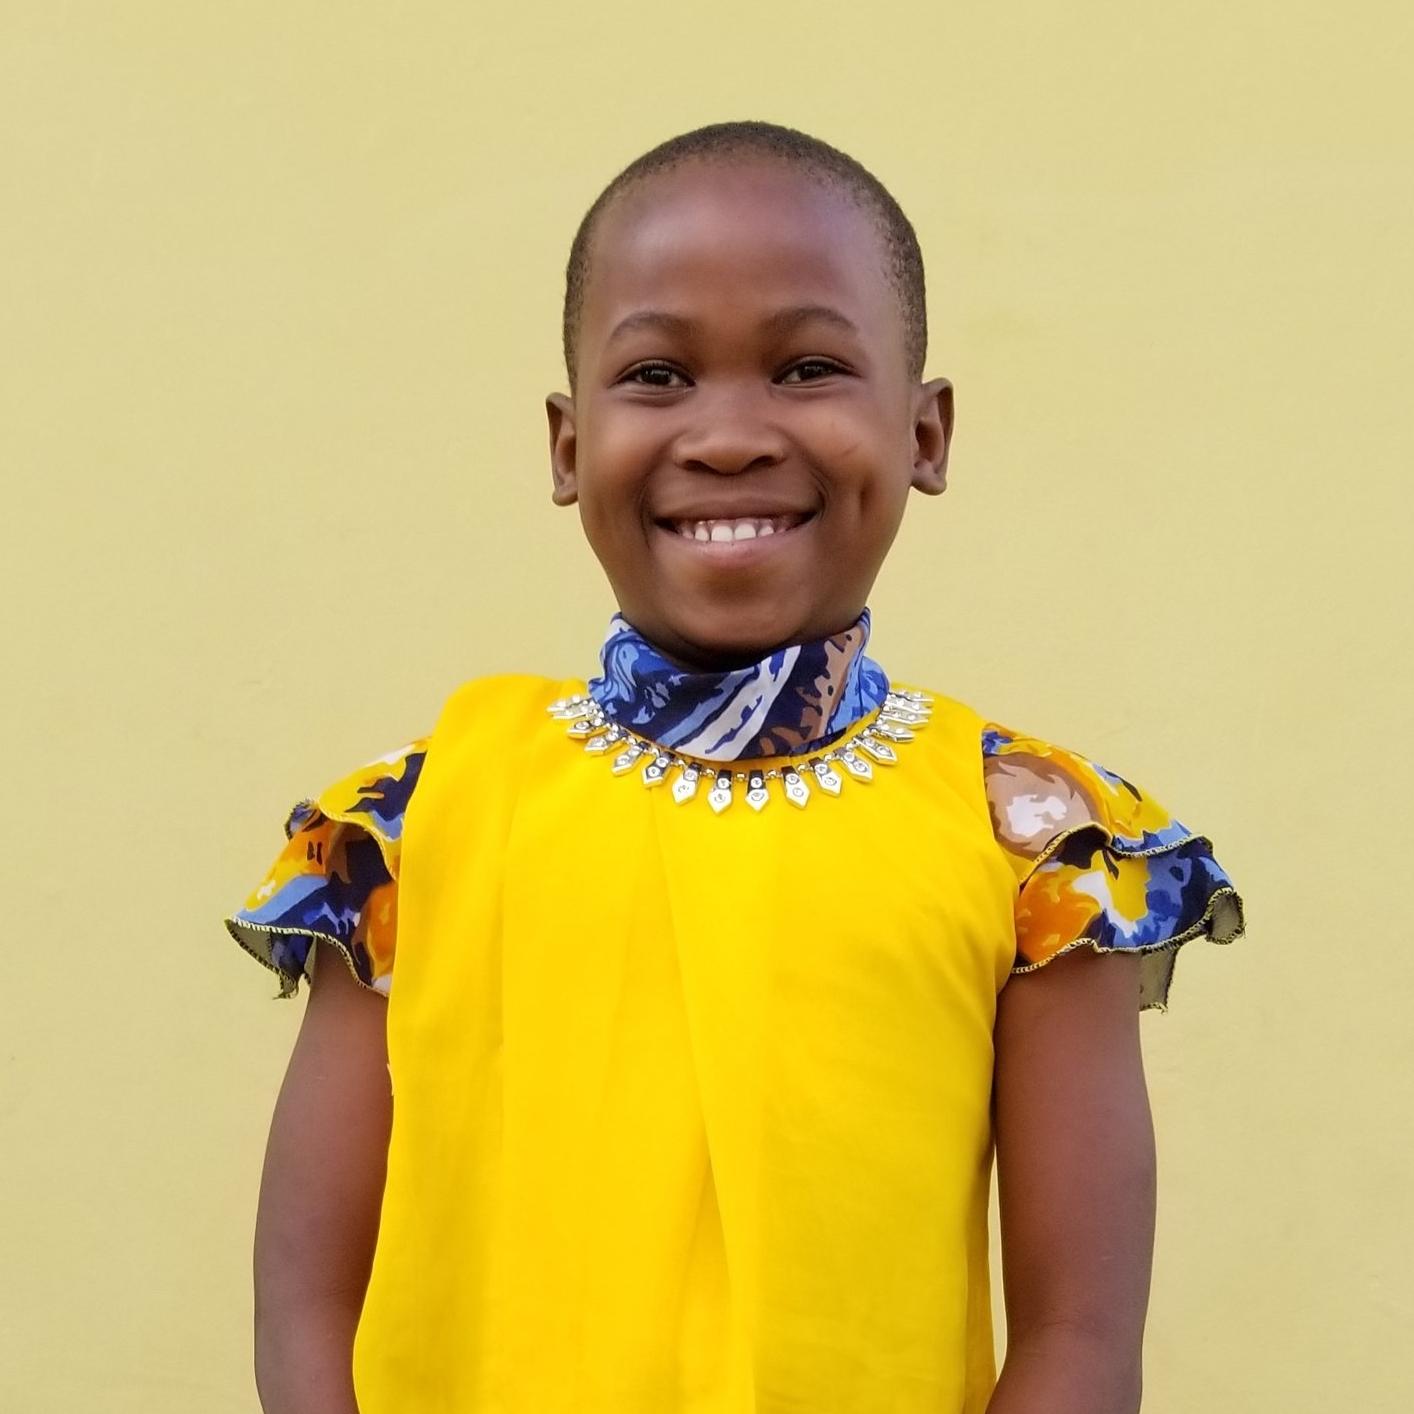 Judith Seif Kasele   Age 7